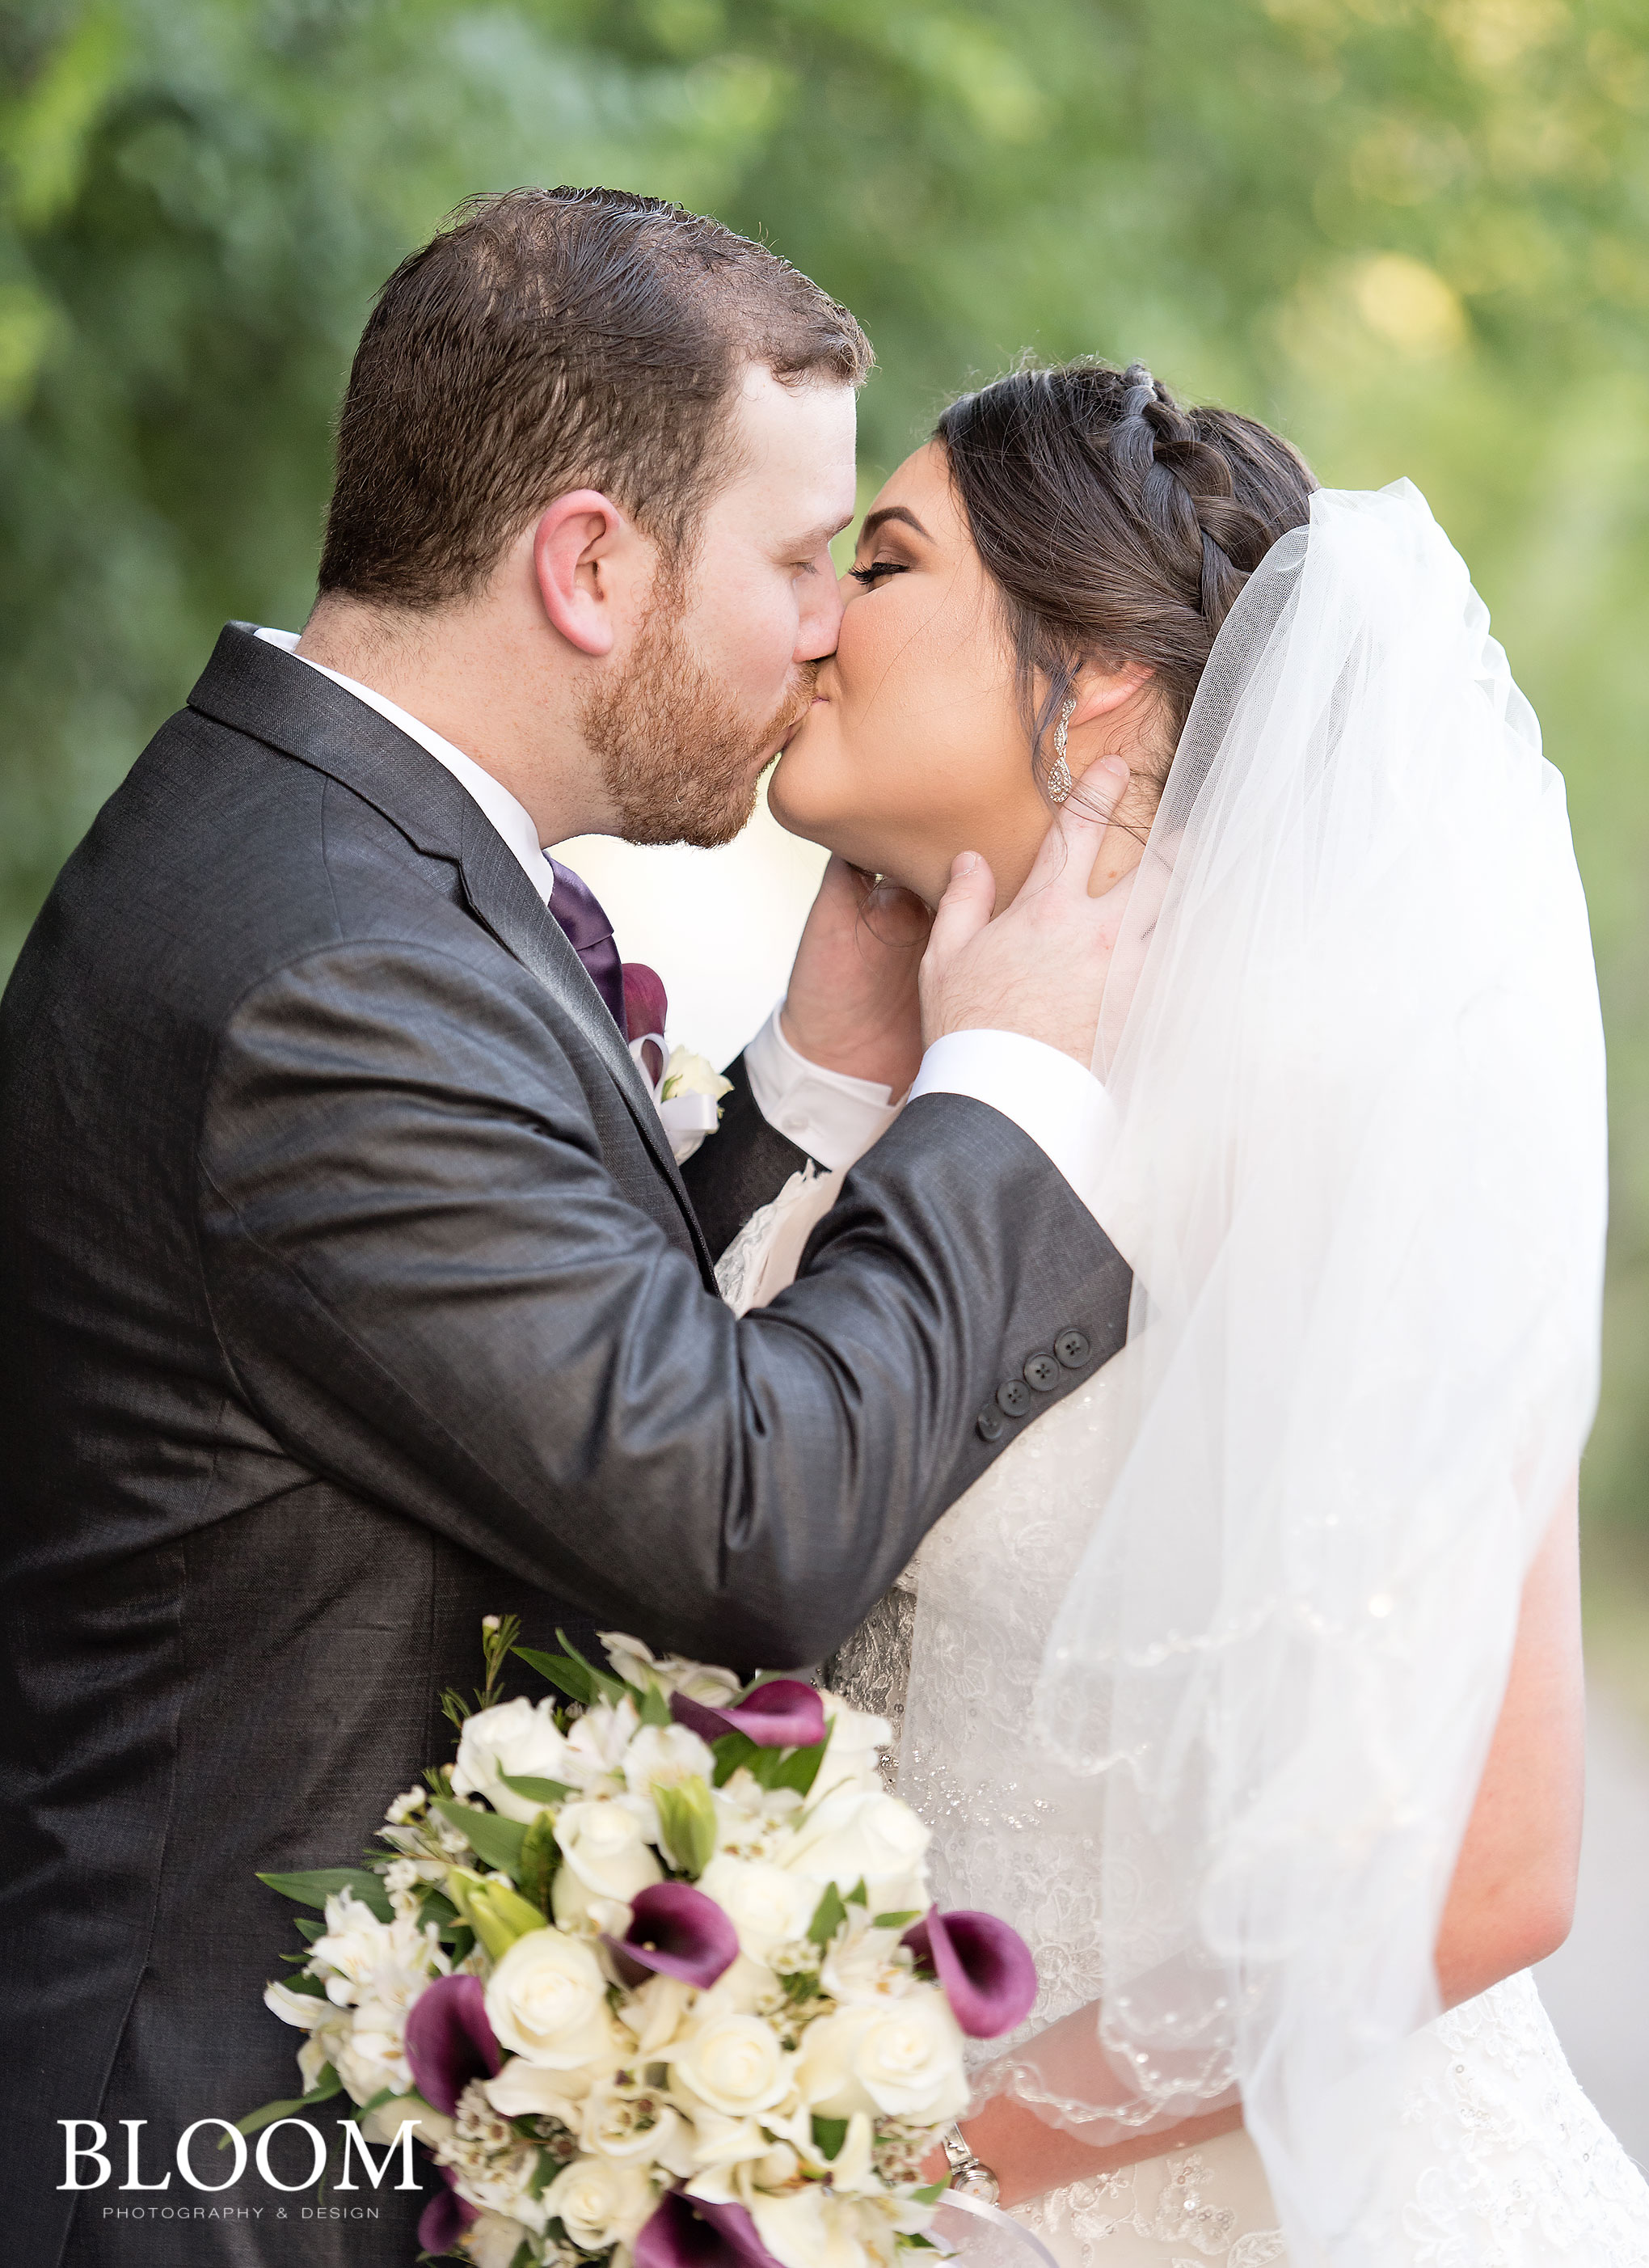 Cortez_Wedding_San_Antonio_Texas_photographer_bloom_051518_1291-Edit.jpg